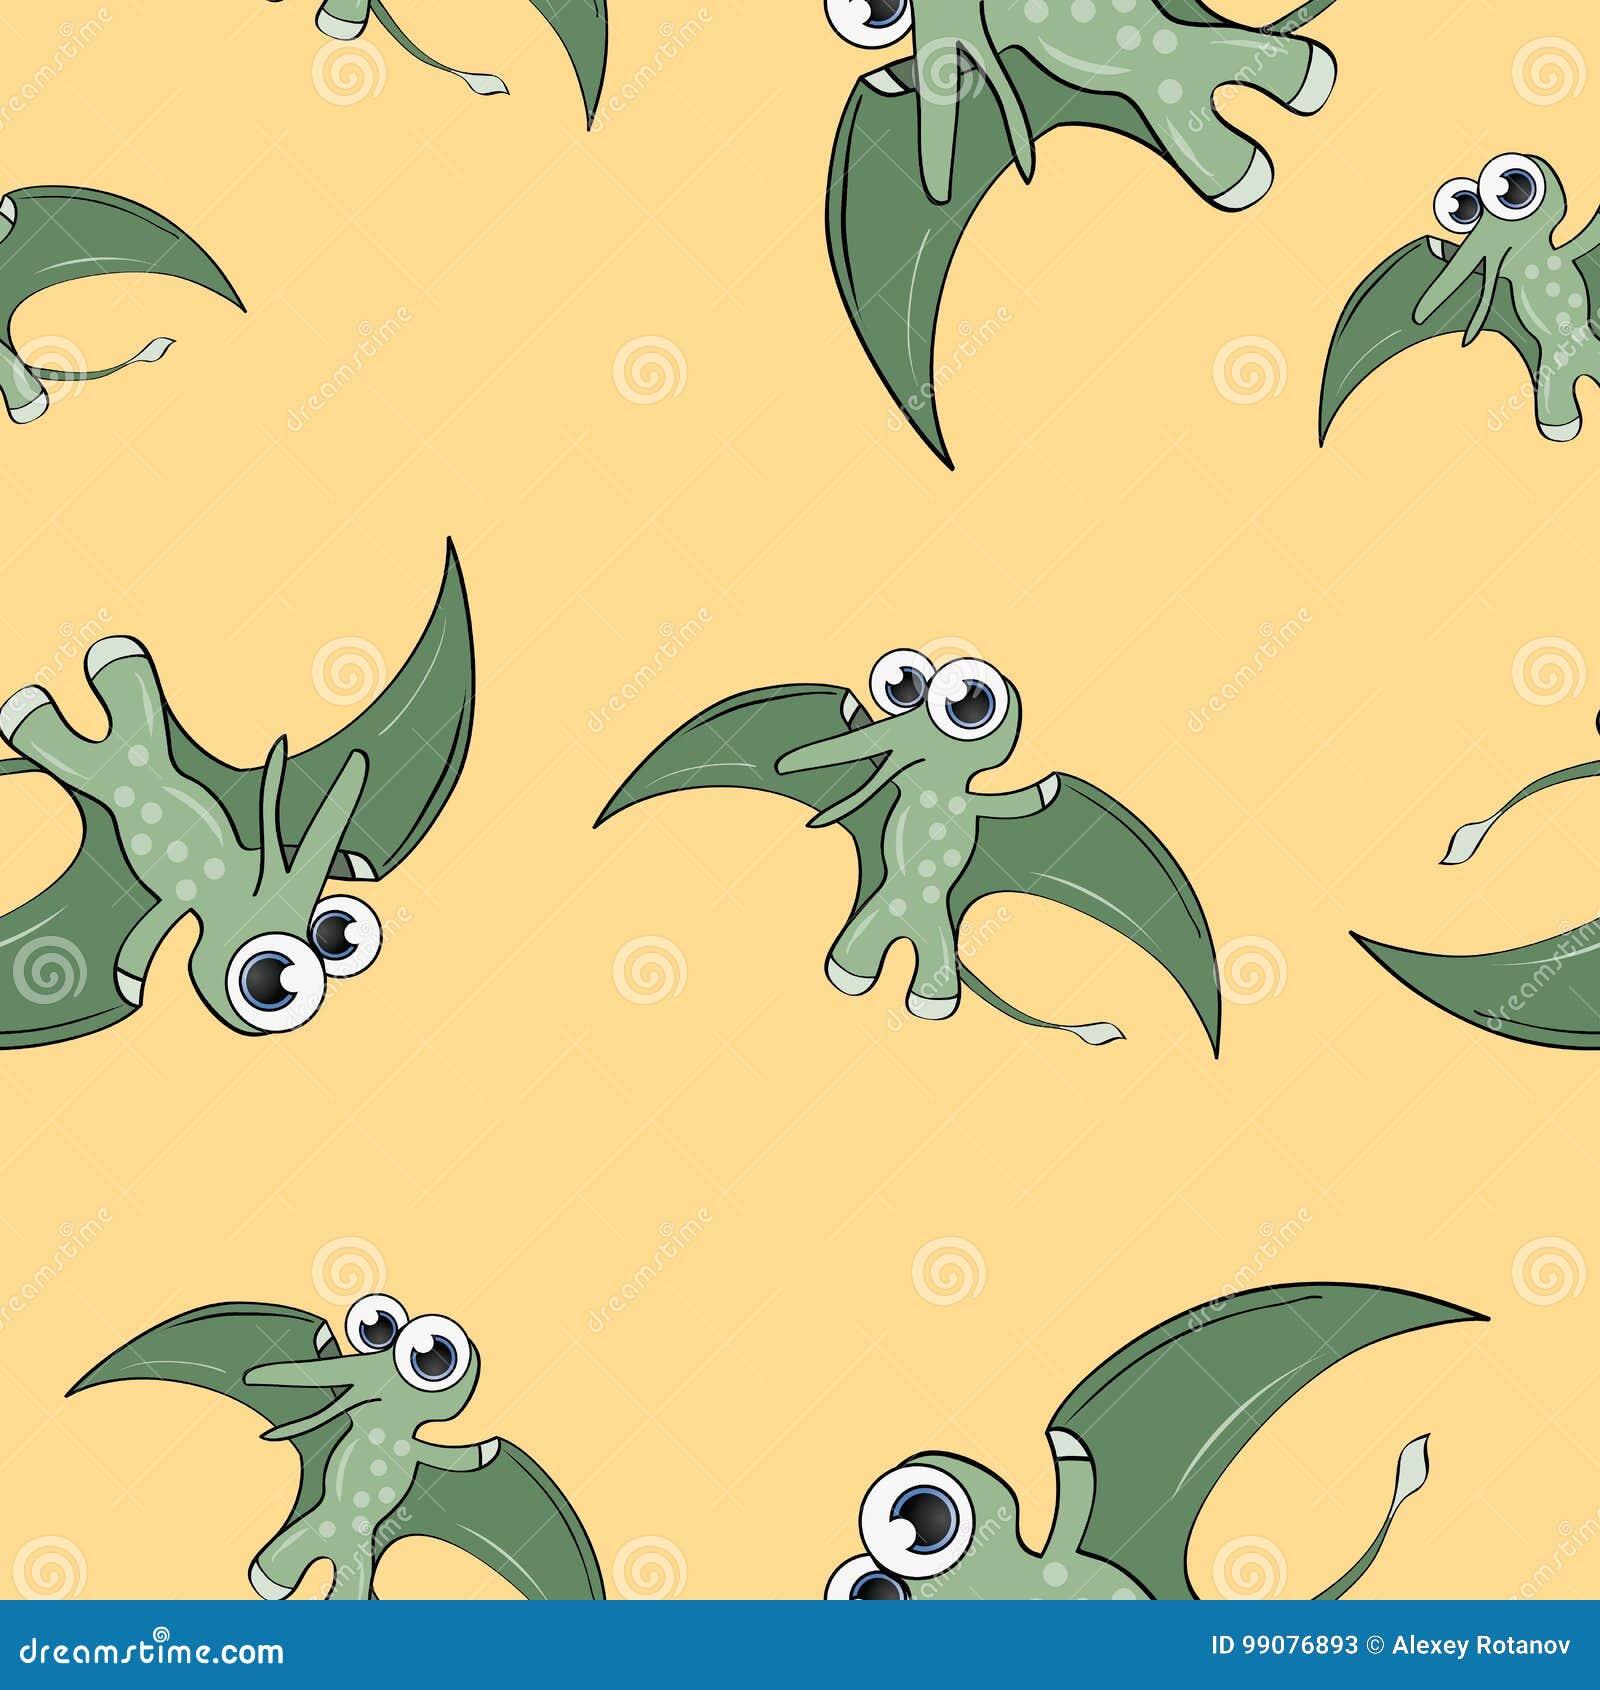 Funny cartoon dinosaur seamless pattern